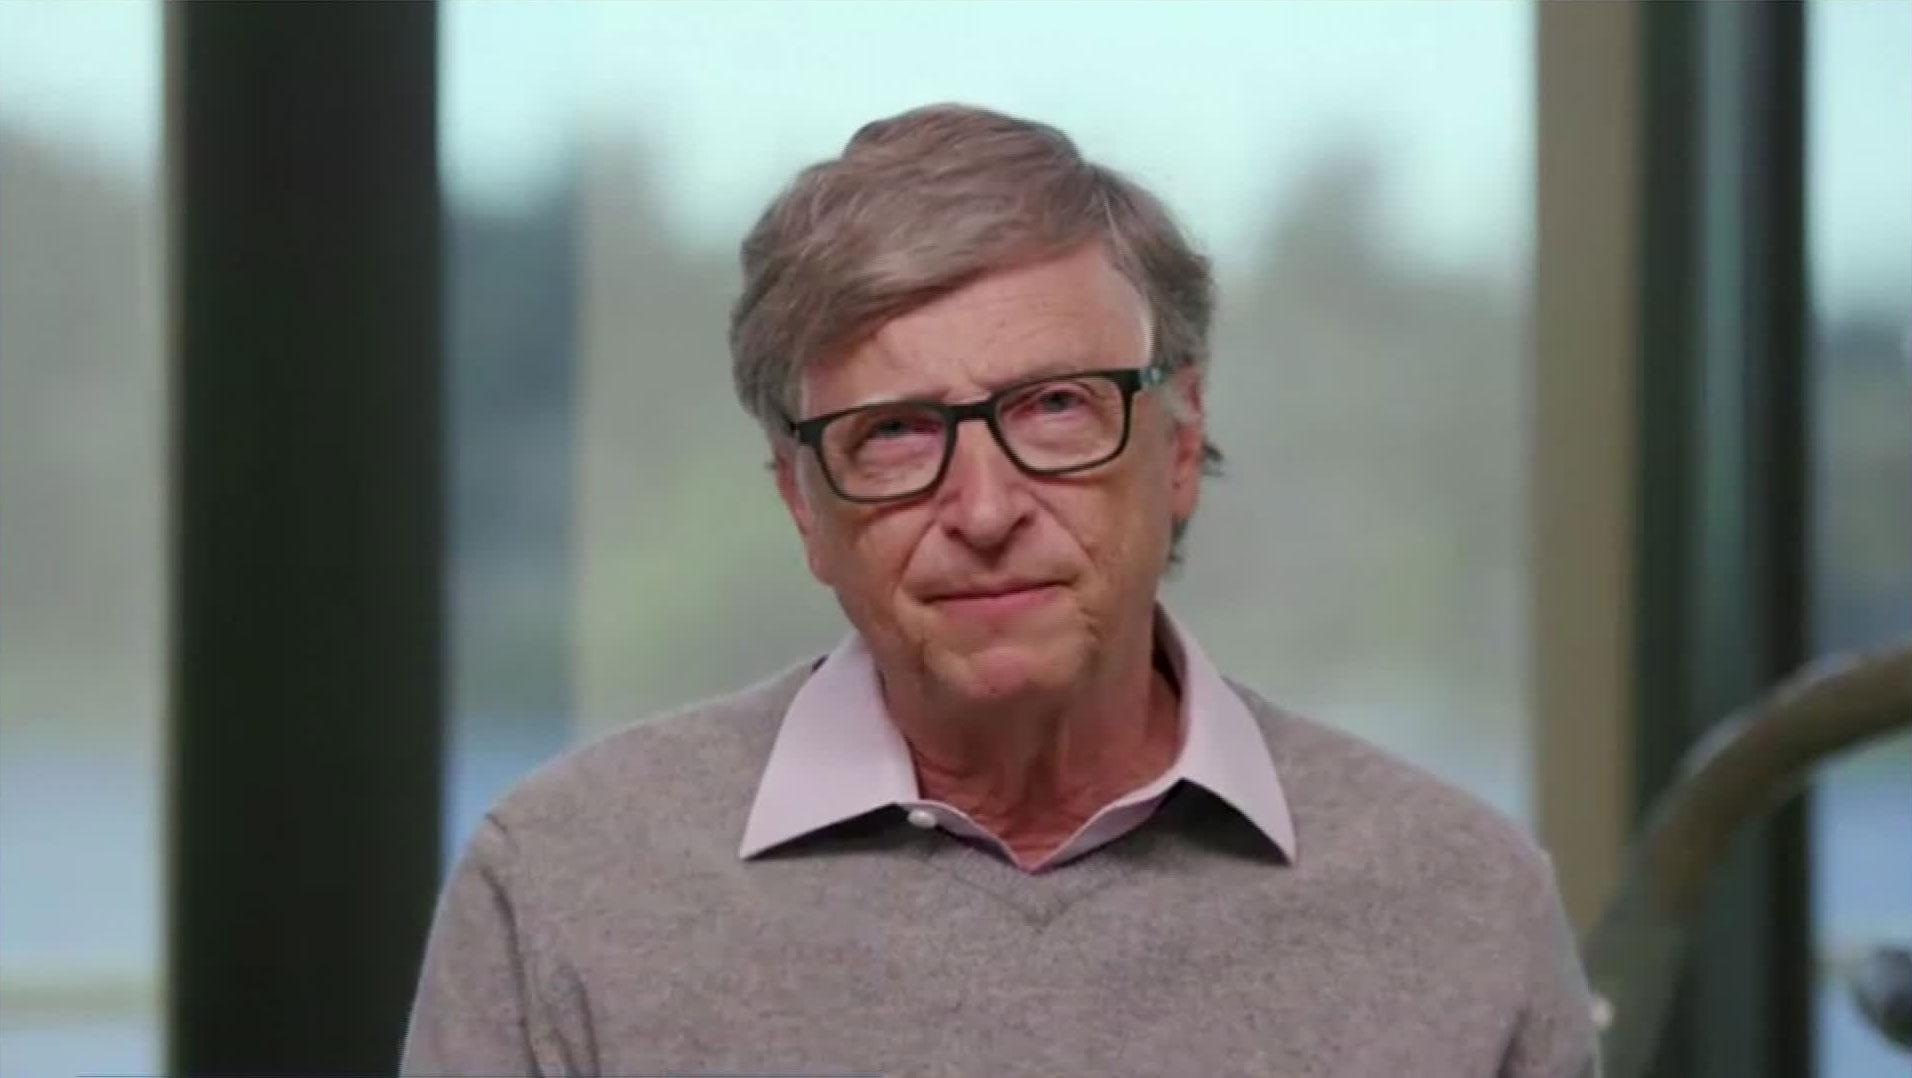 BillGates speaks at a World Health Organization briefing on September 30.